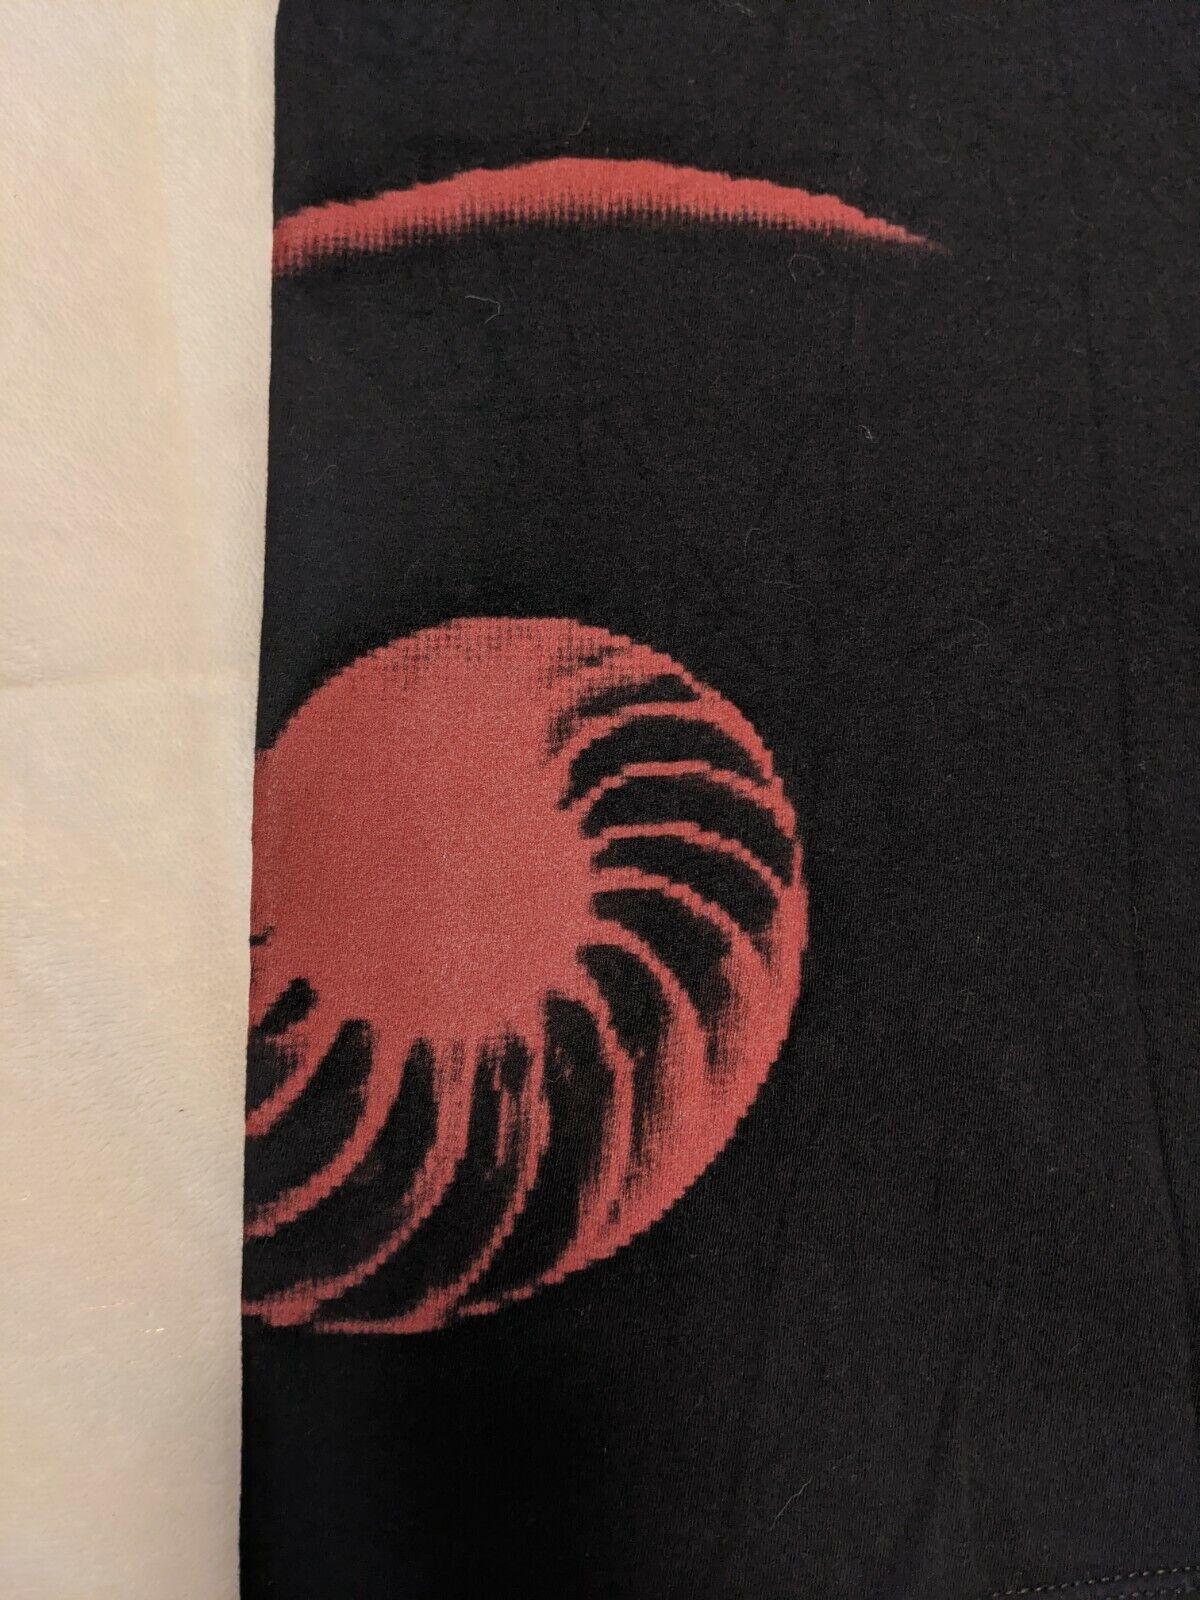 Vintage Nine Inch Nails The Spiral NIN Fan Club T… - image 3